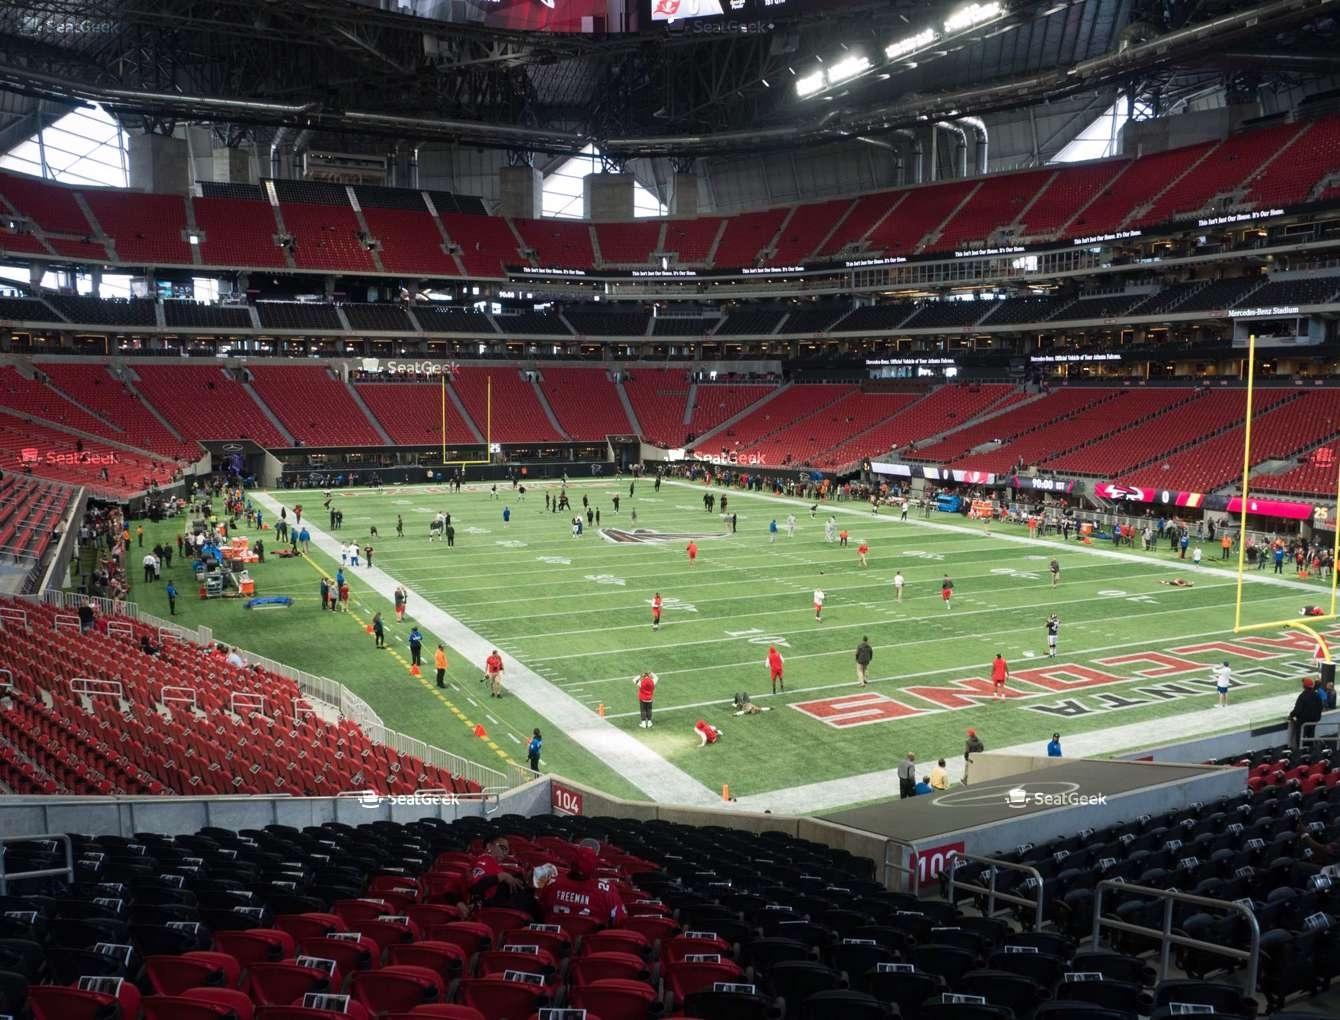 Mercedes-Benz Stadium Section 104 Seat Views   Seatgeek for Mercedes Benz Stadium Super Bowl Map